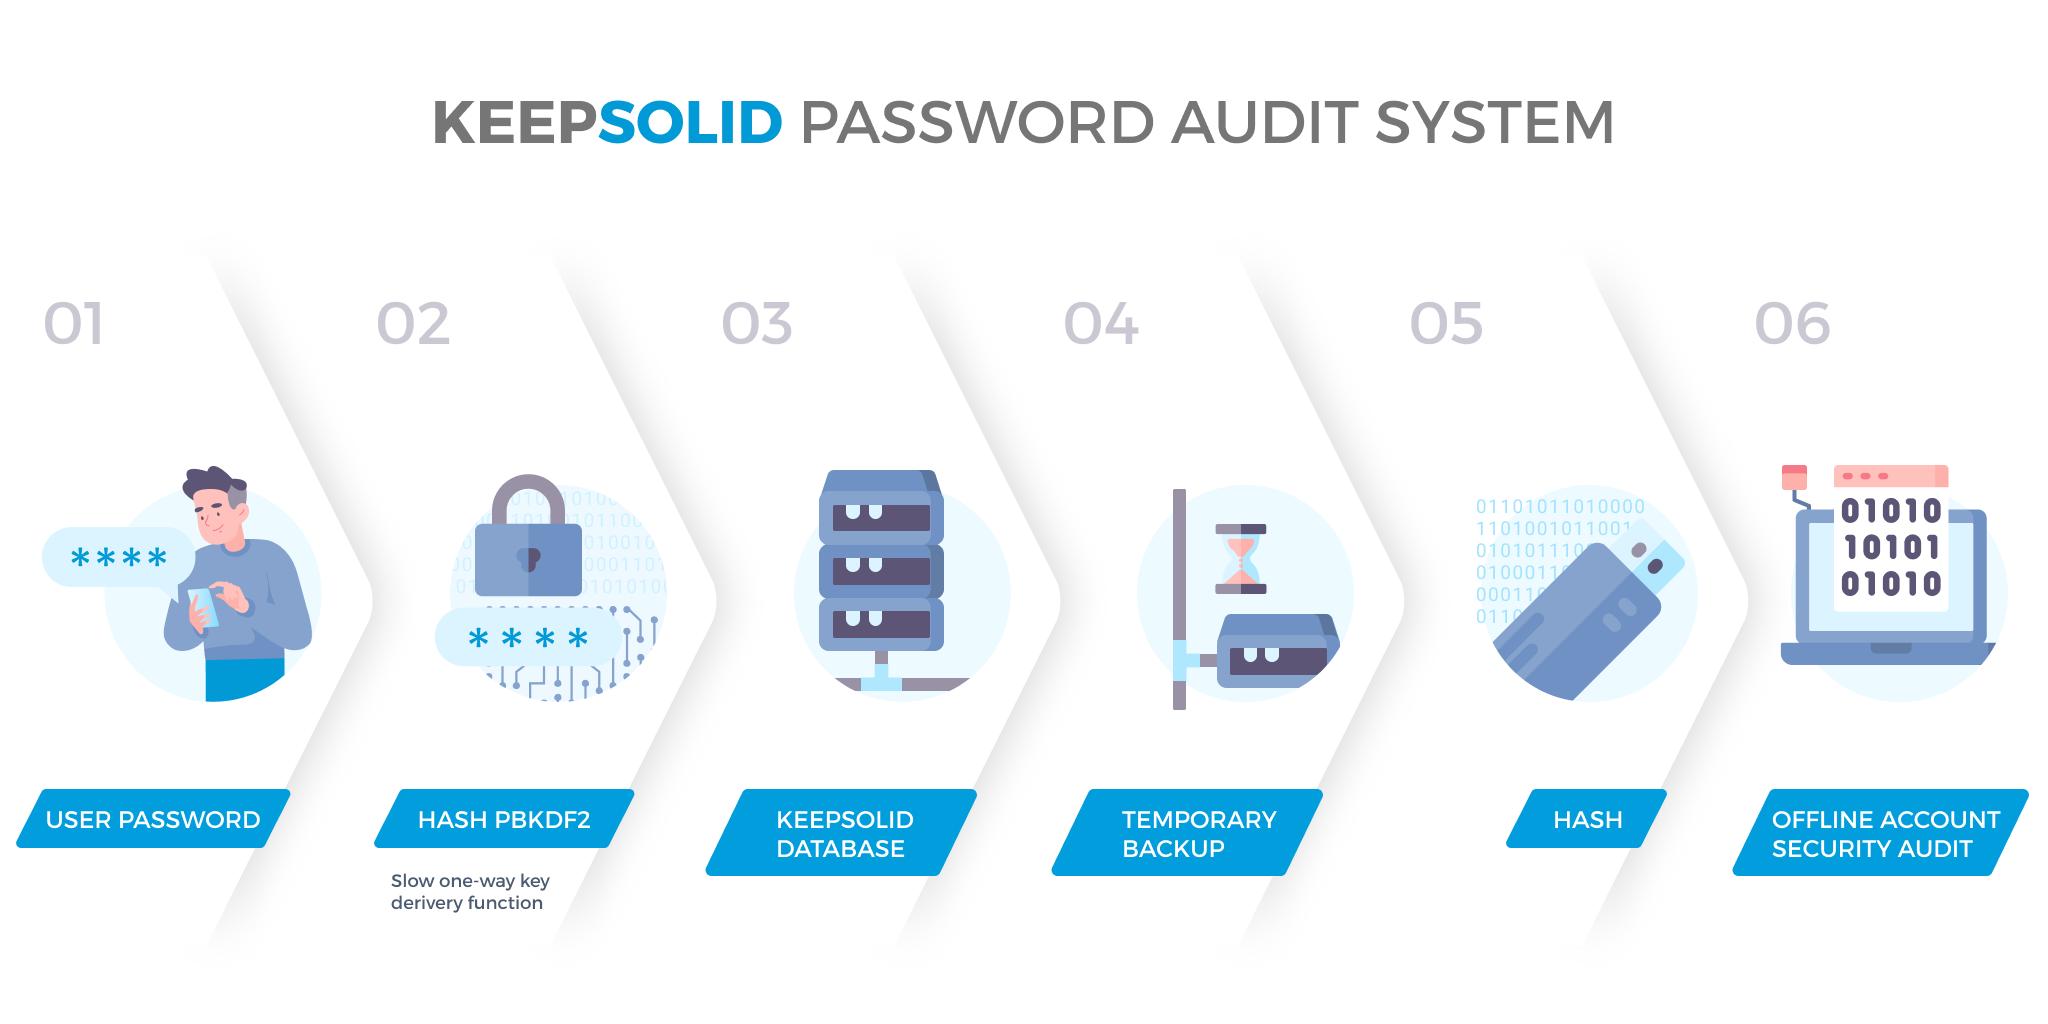 KeepSolid password audit system